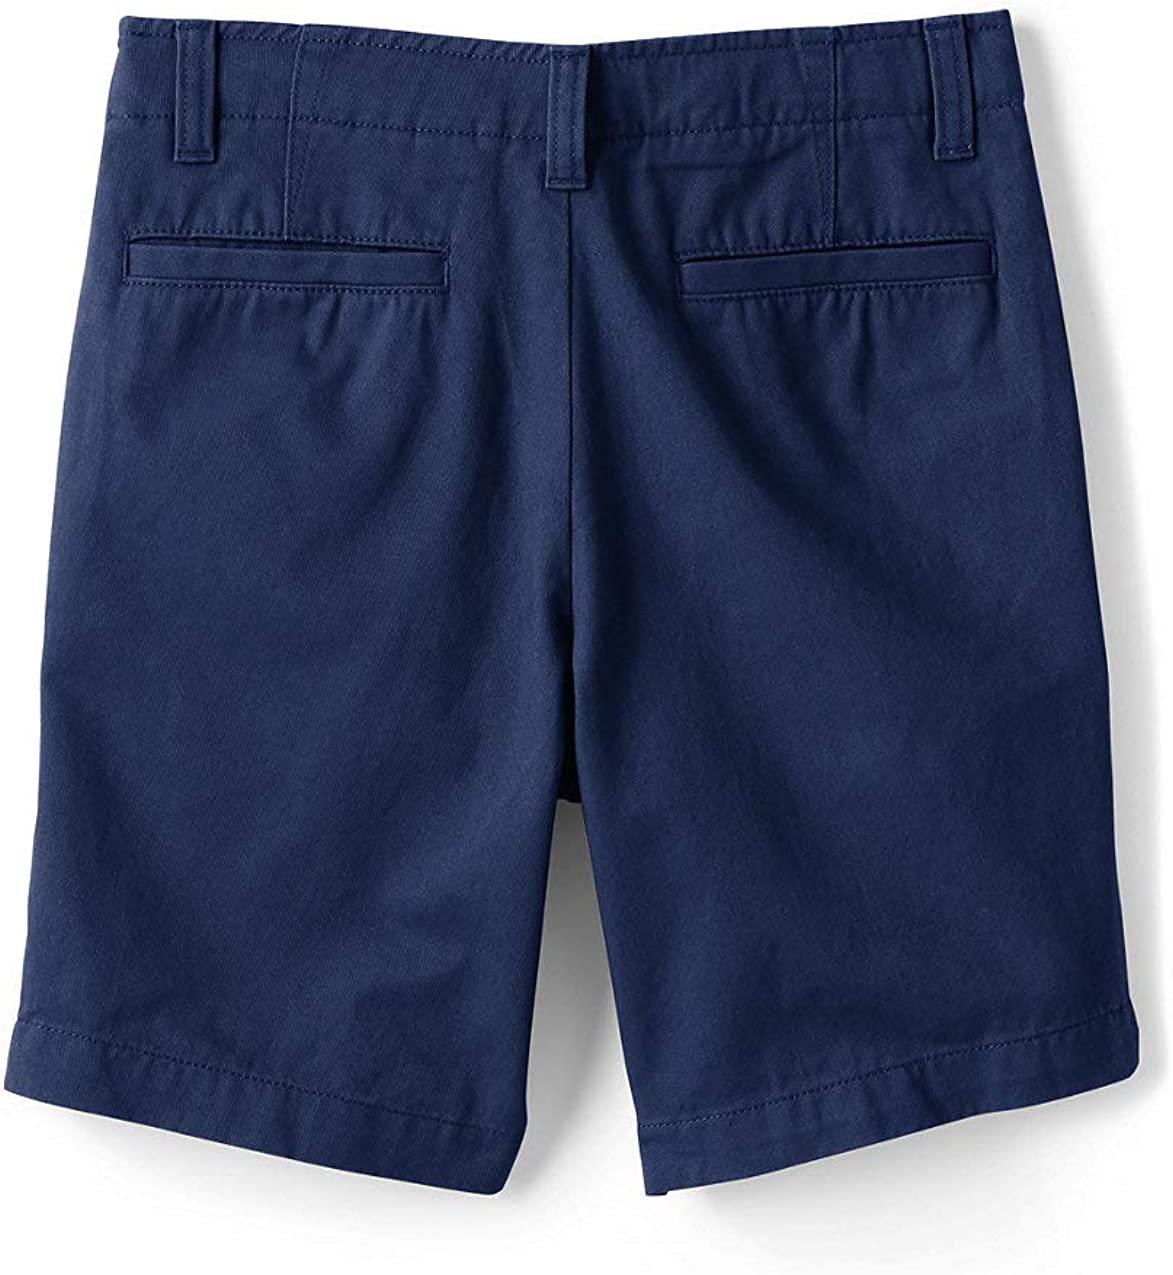 Lands End Boys Chino Cadet Shorts